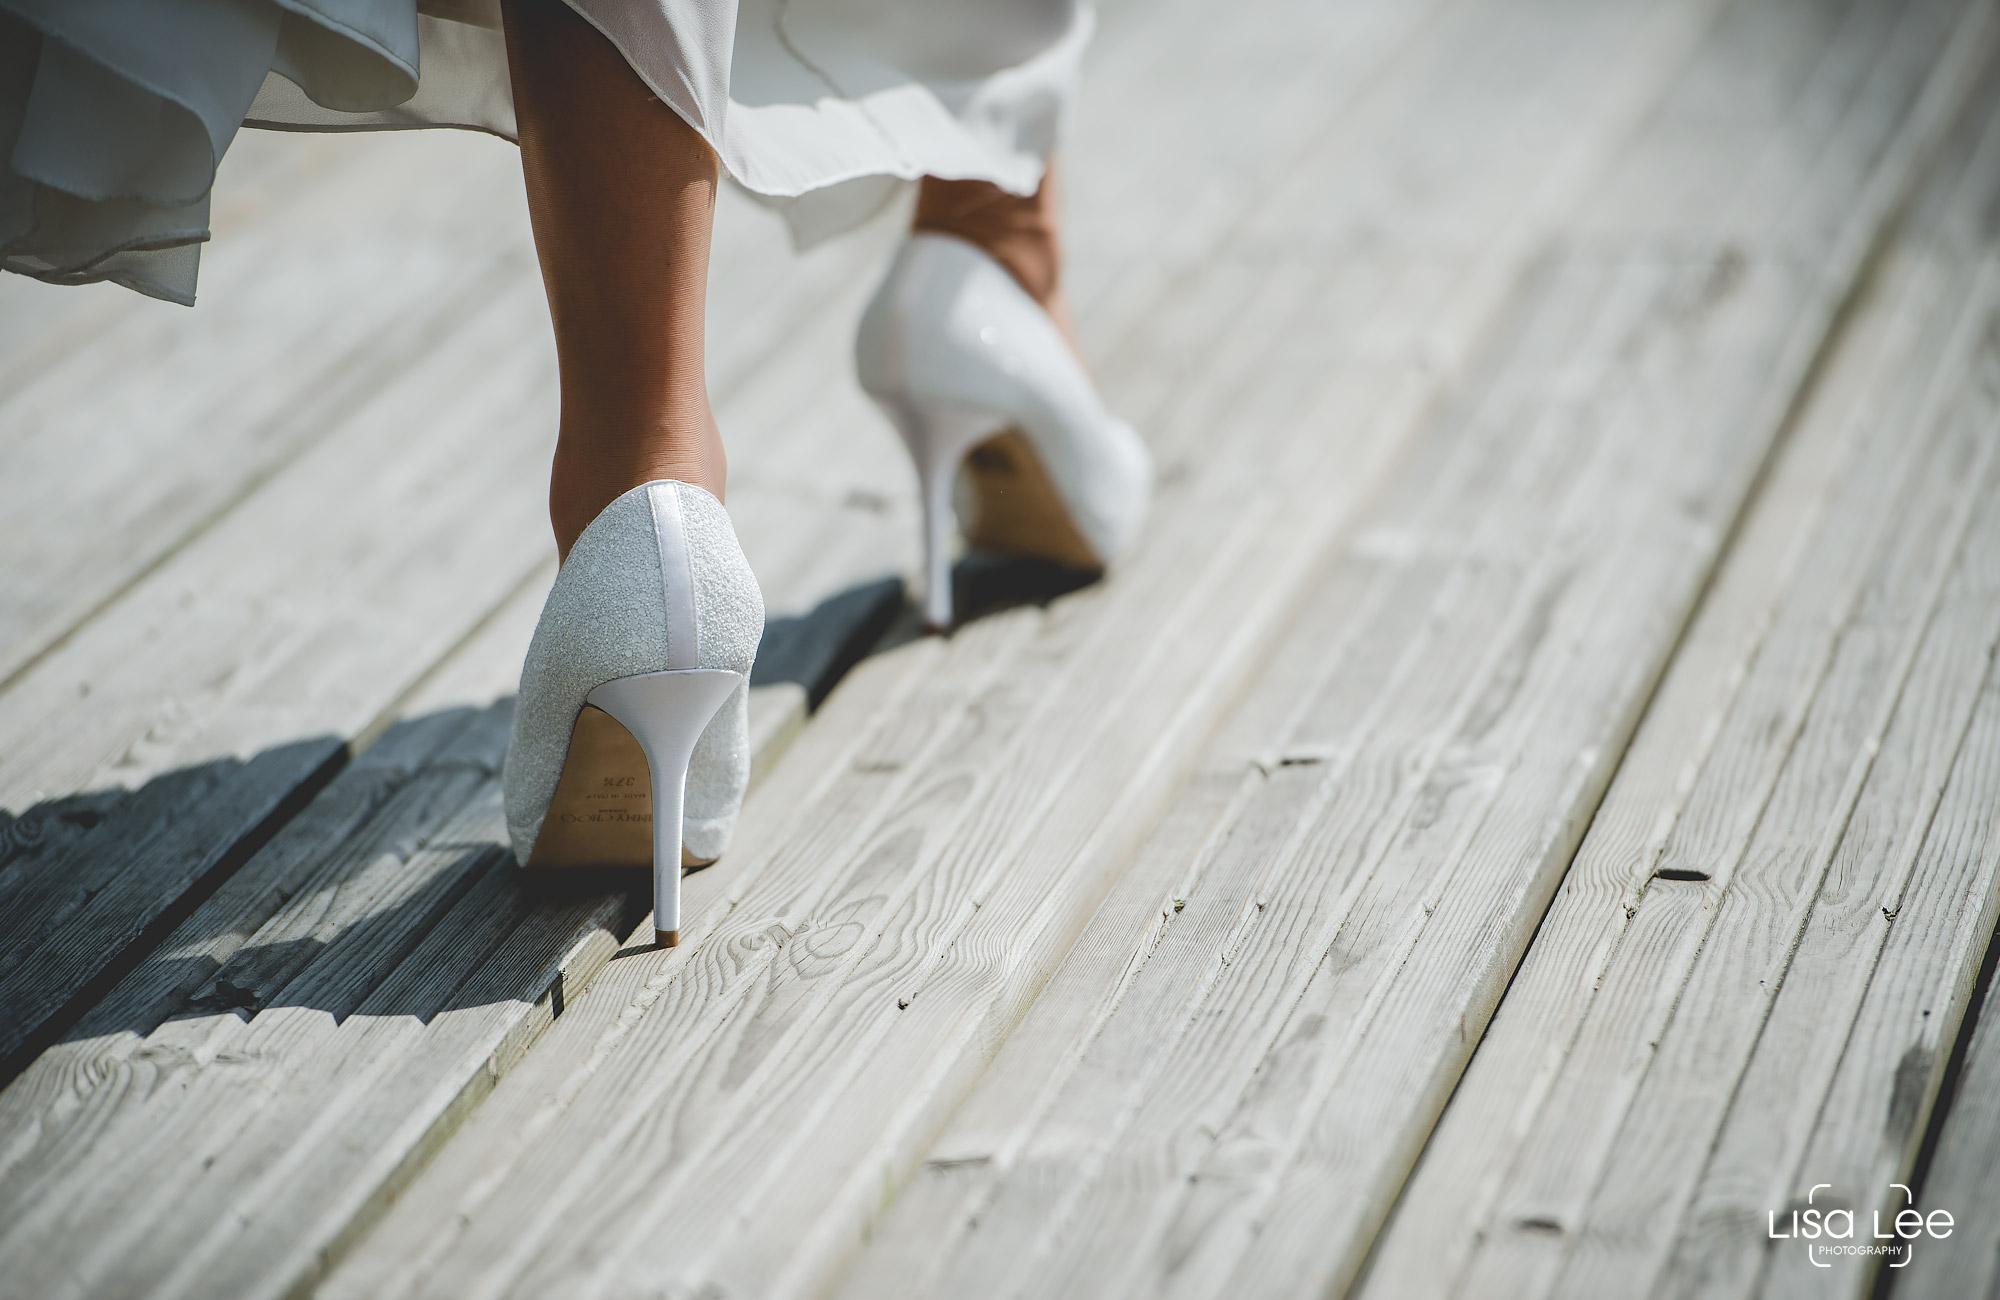 lisa-lee-wedding-photography-christchurch-dorset-brideshoe.jpg